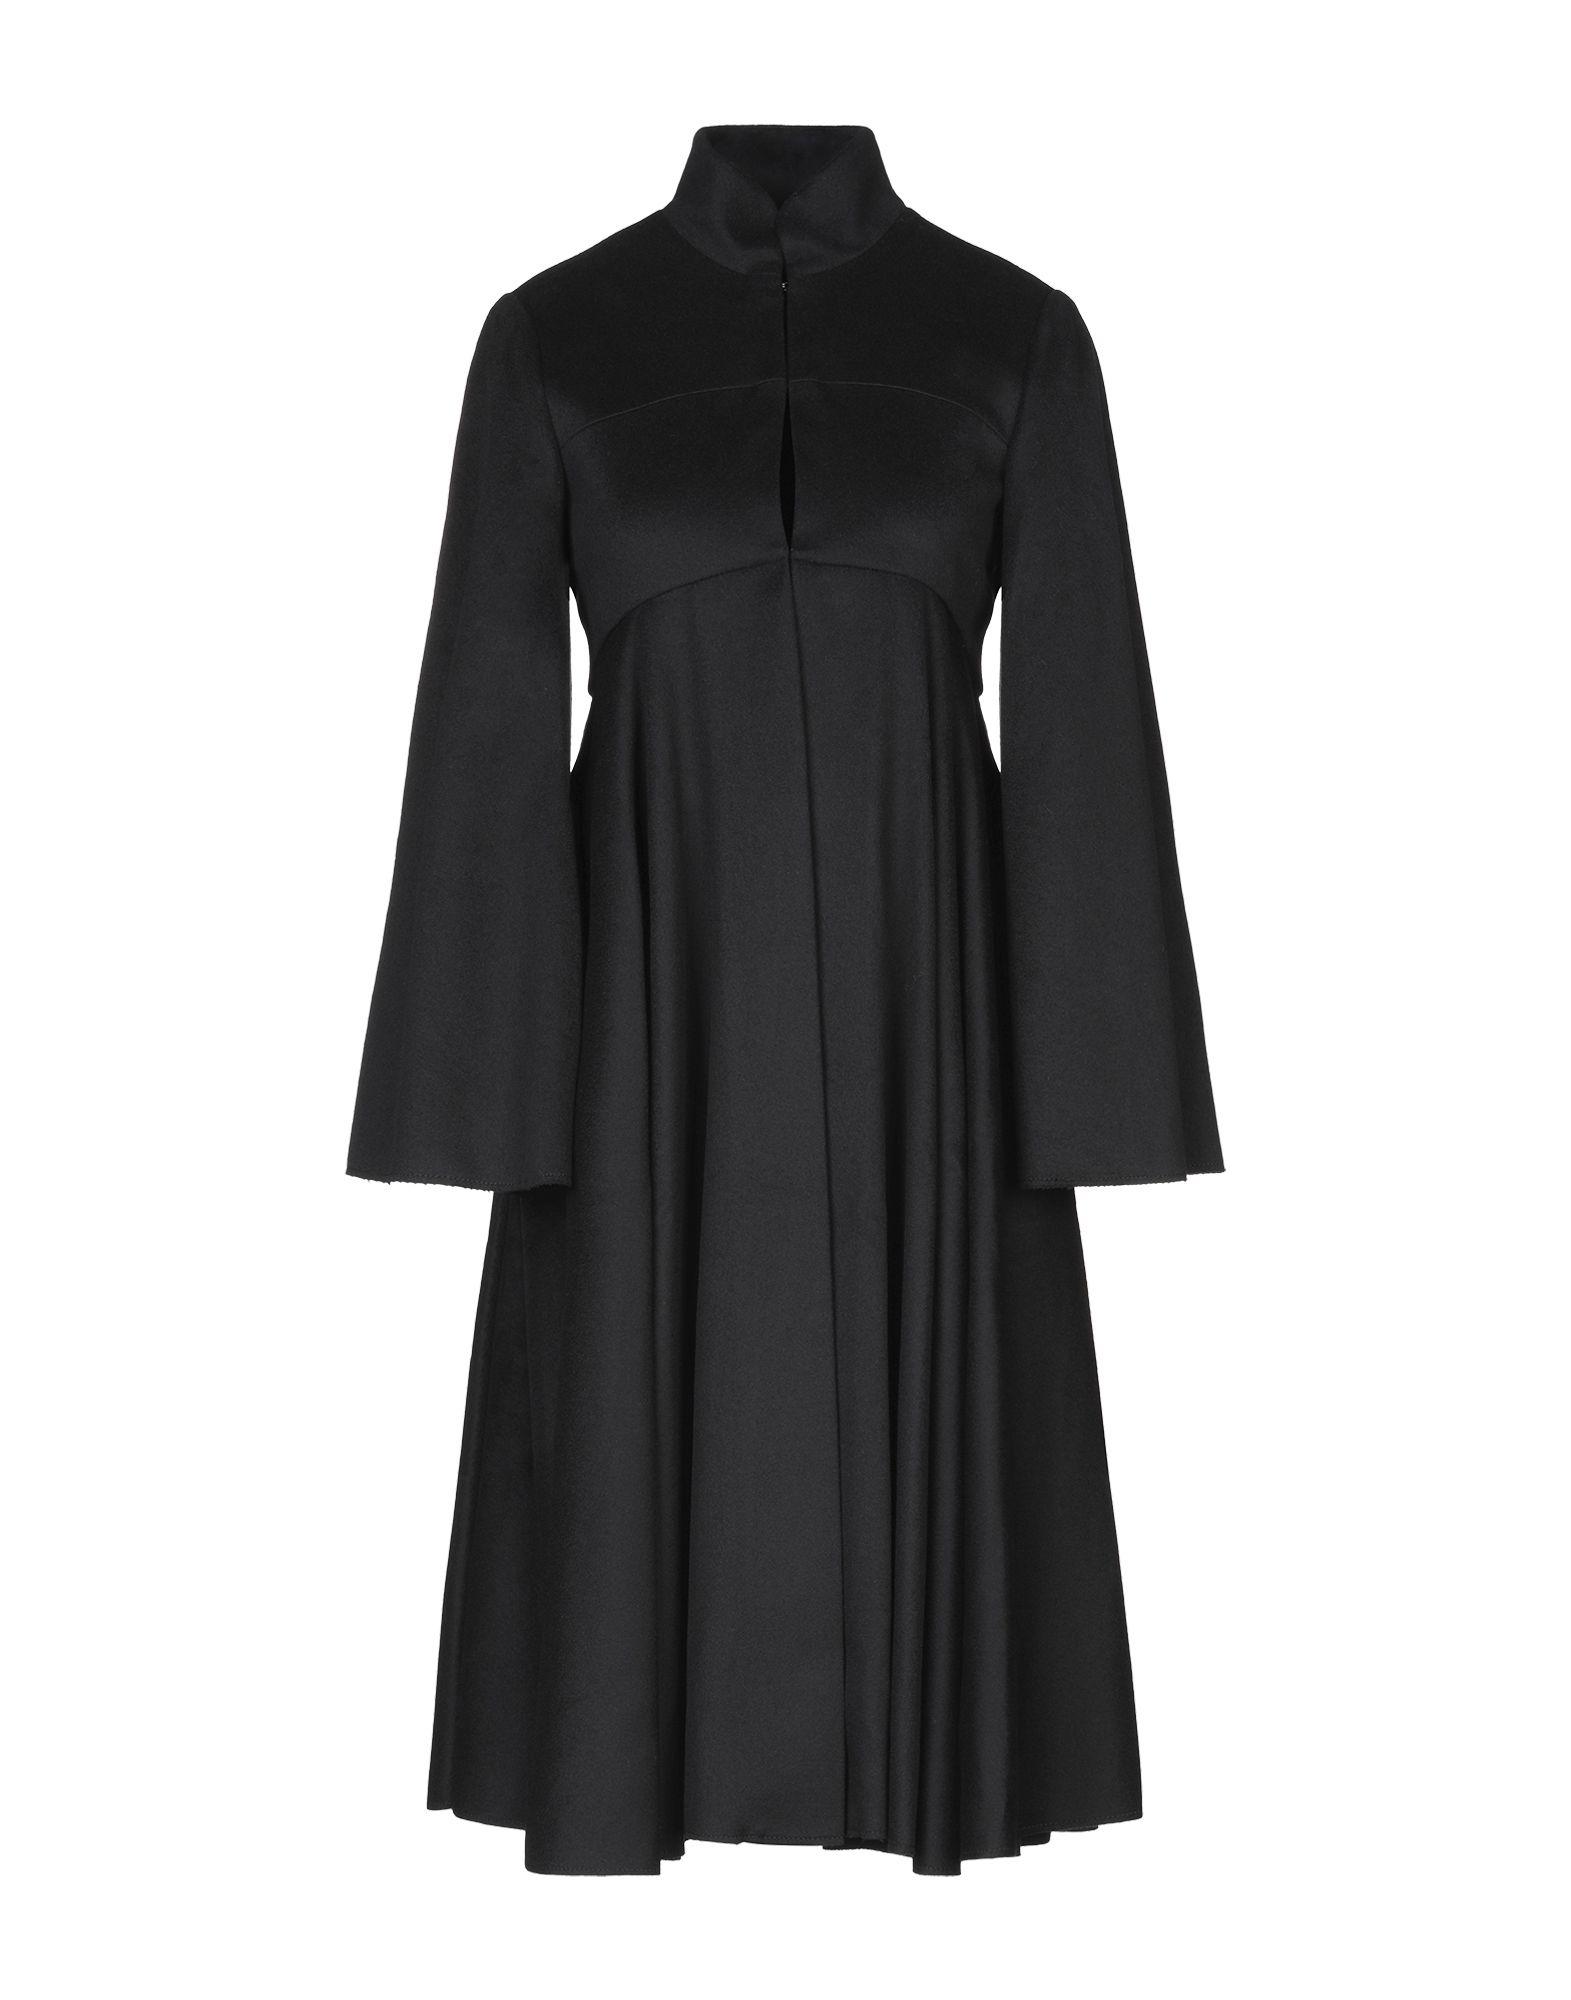 BURBERRY Overcoats - Item 41969639